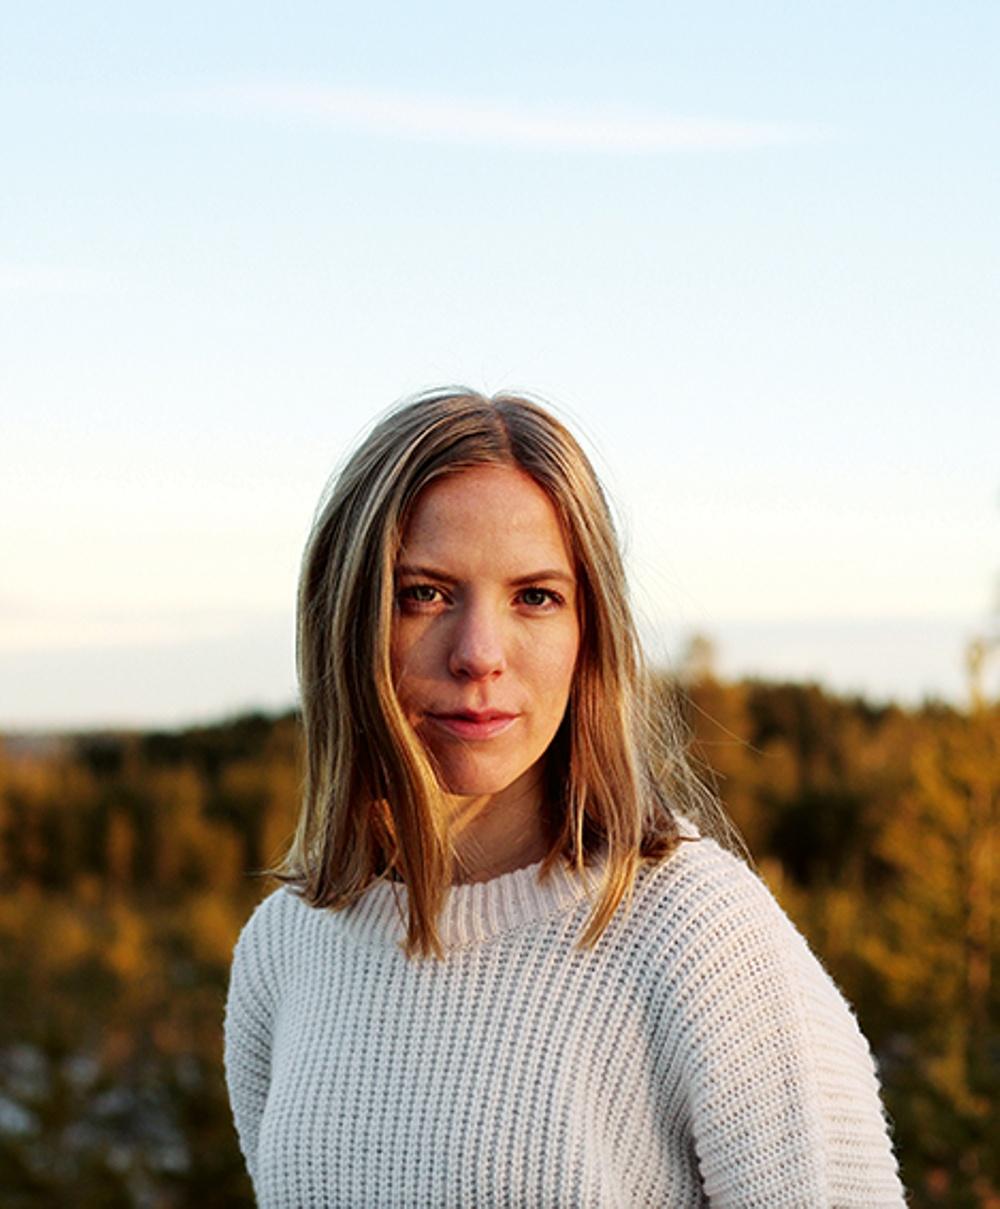 Fotograf Johan Stridfeldt